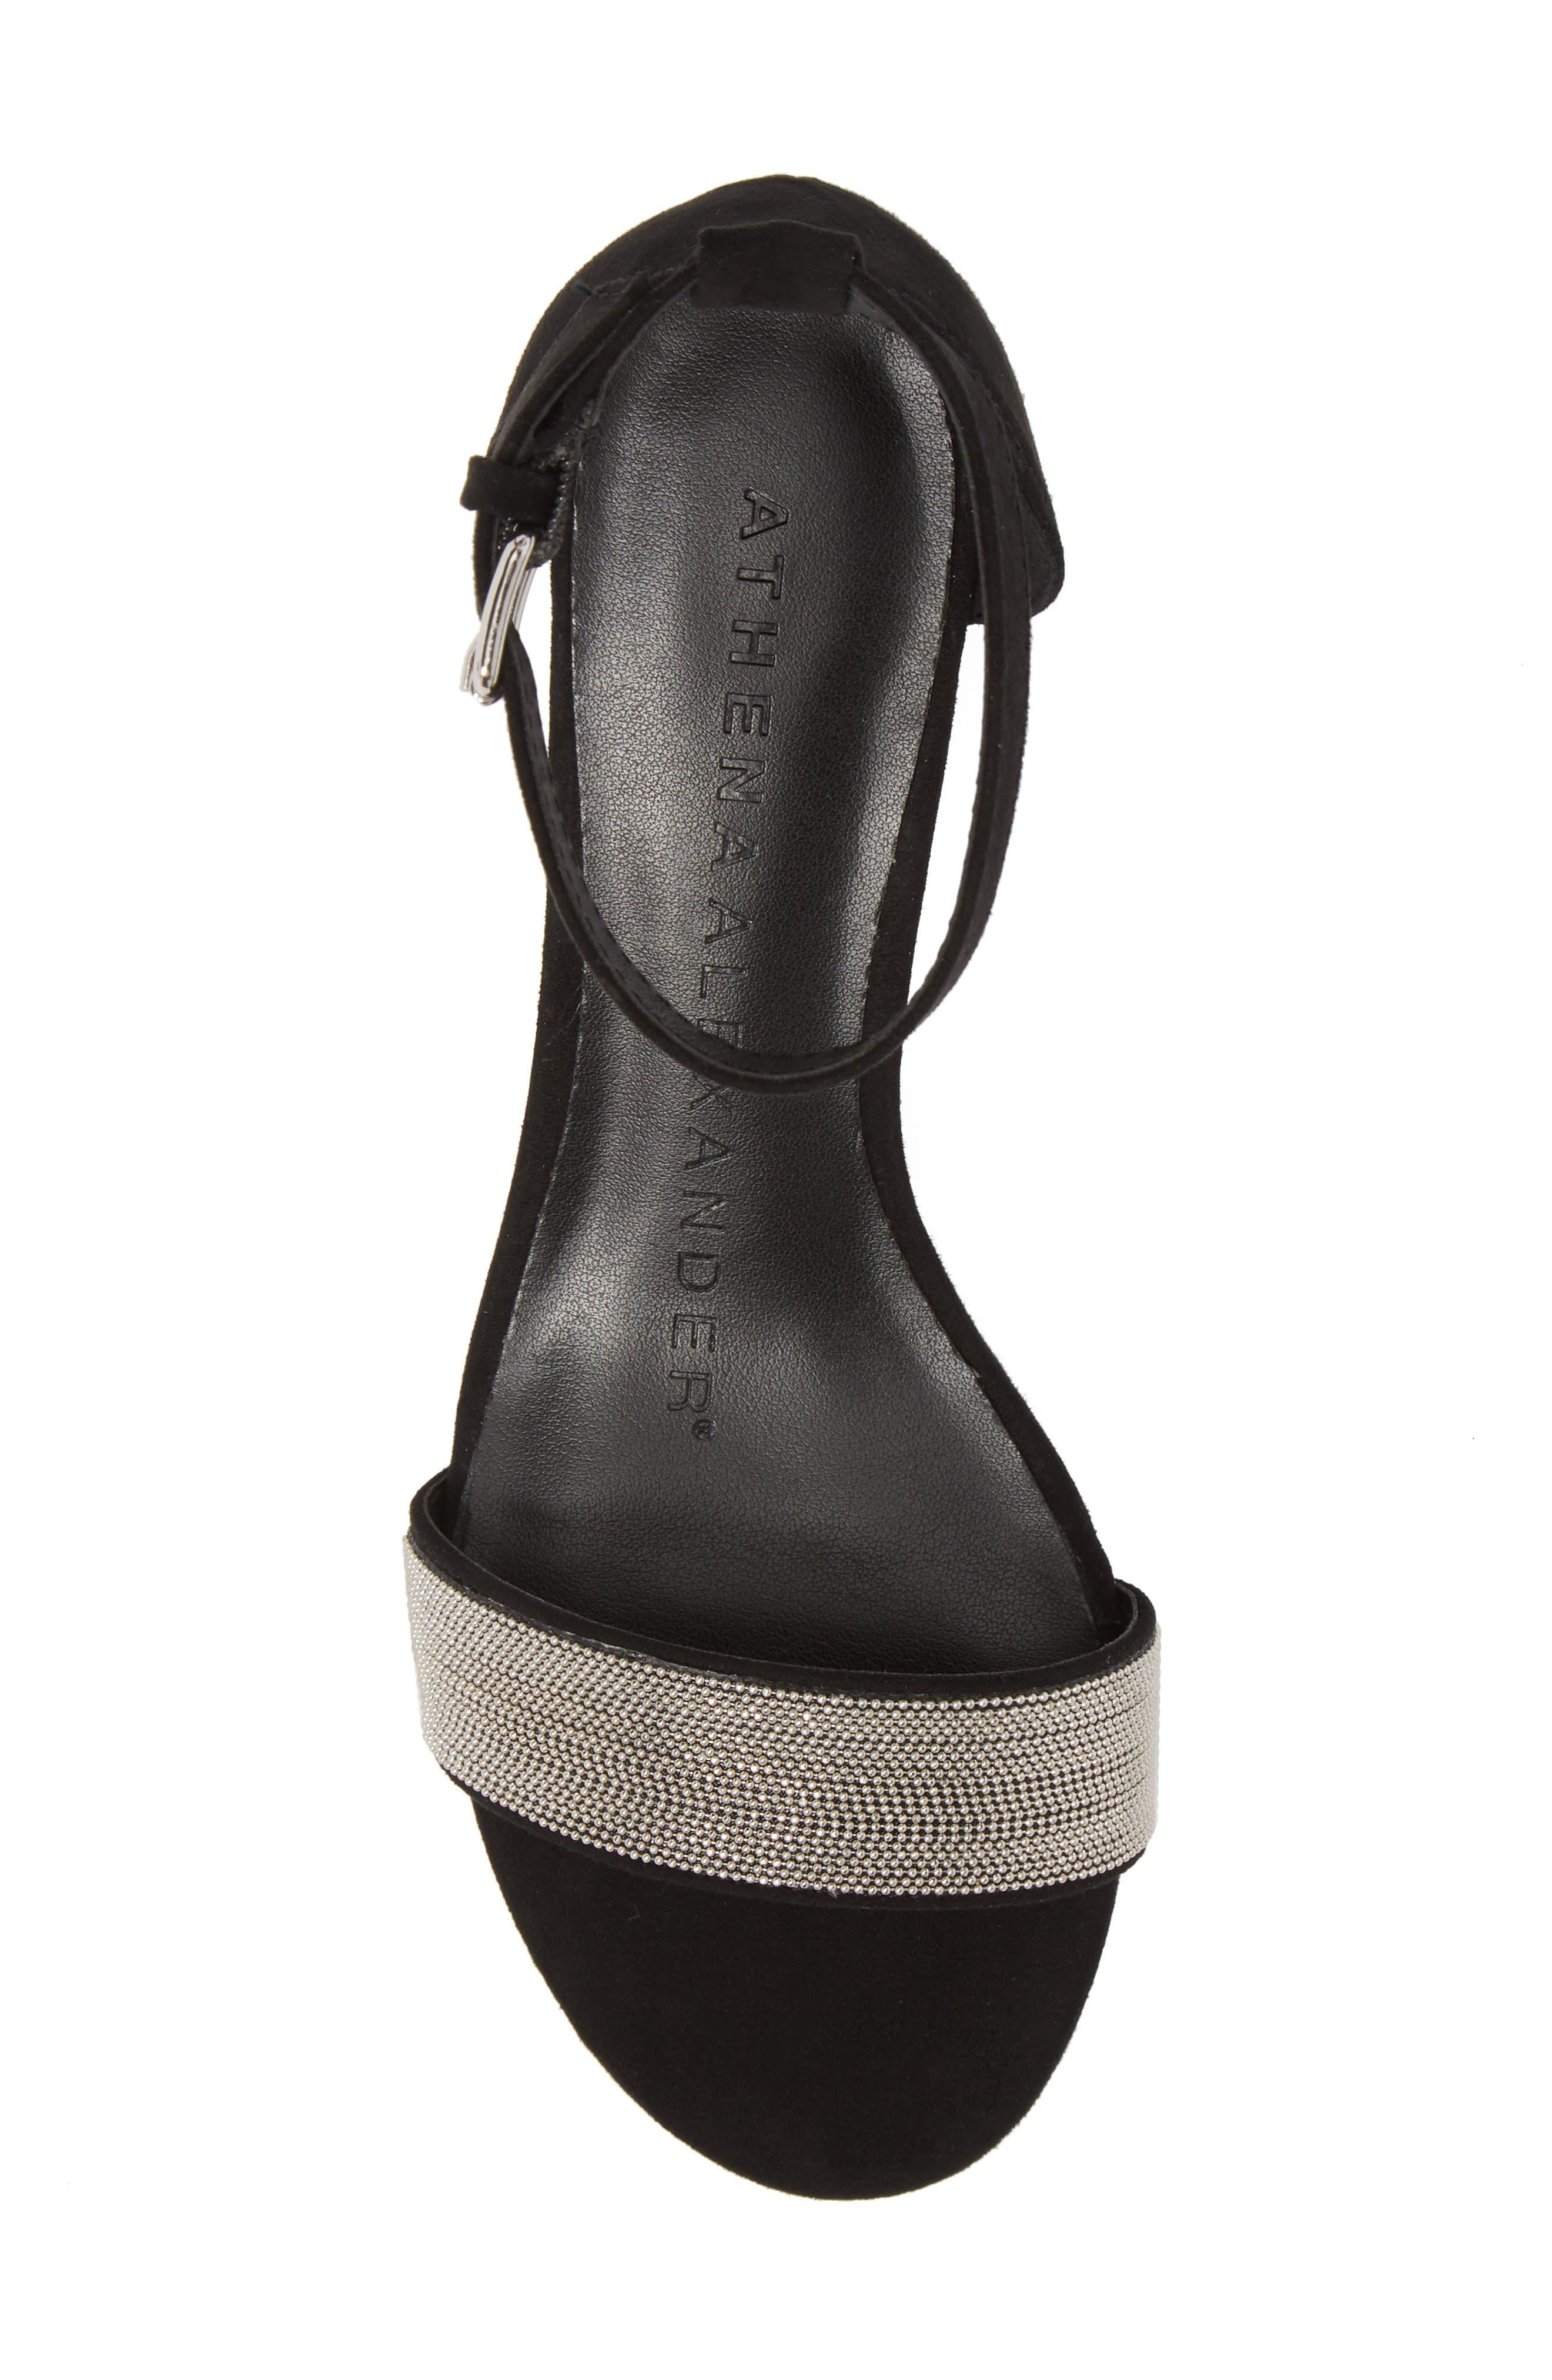 Enfield Ankle Strap Wedge Sandal,                             Alternate thumbnail 5, color,                             003